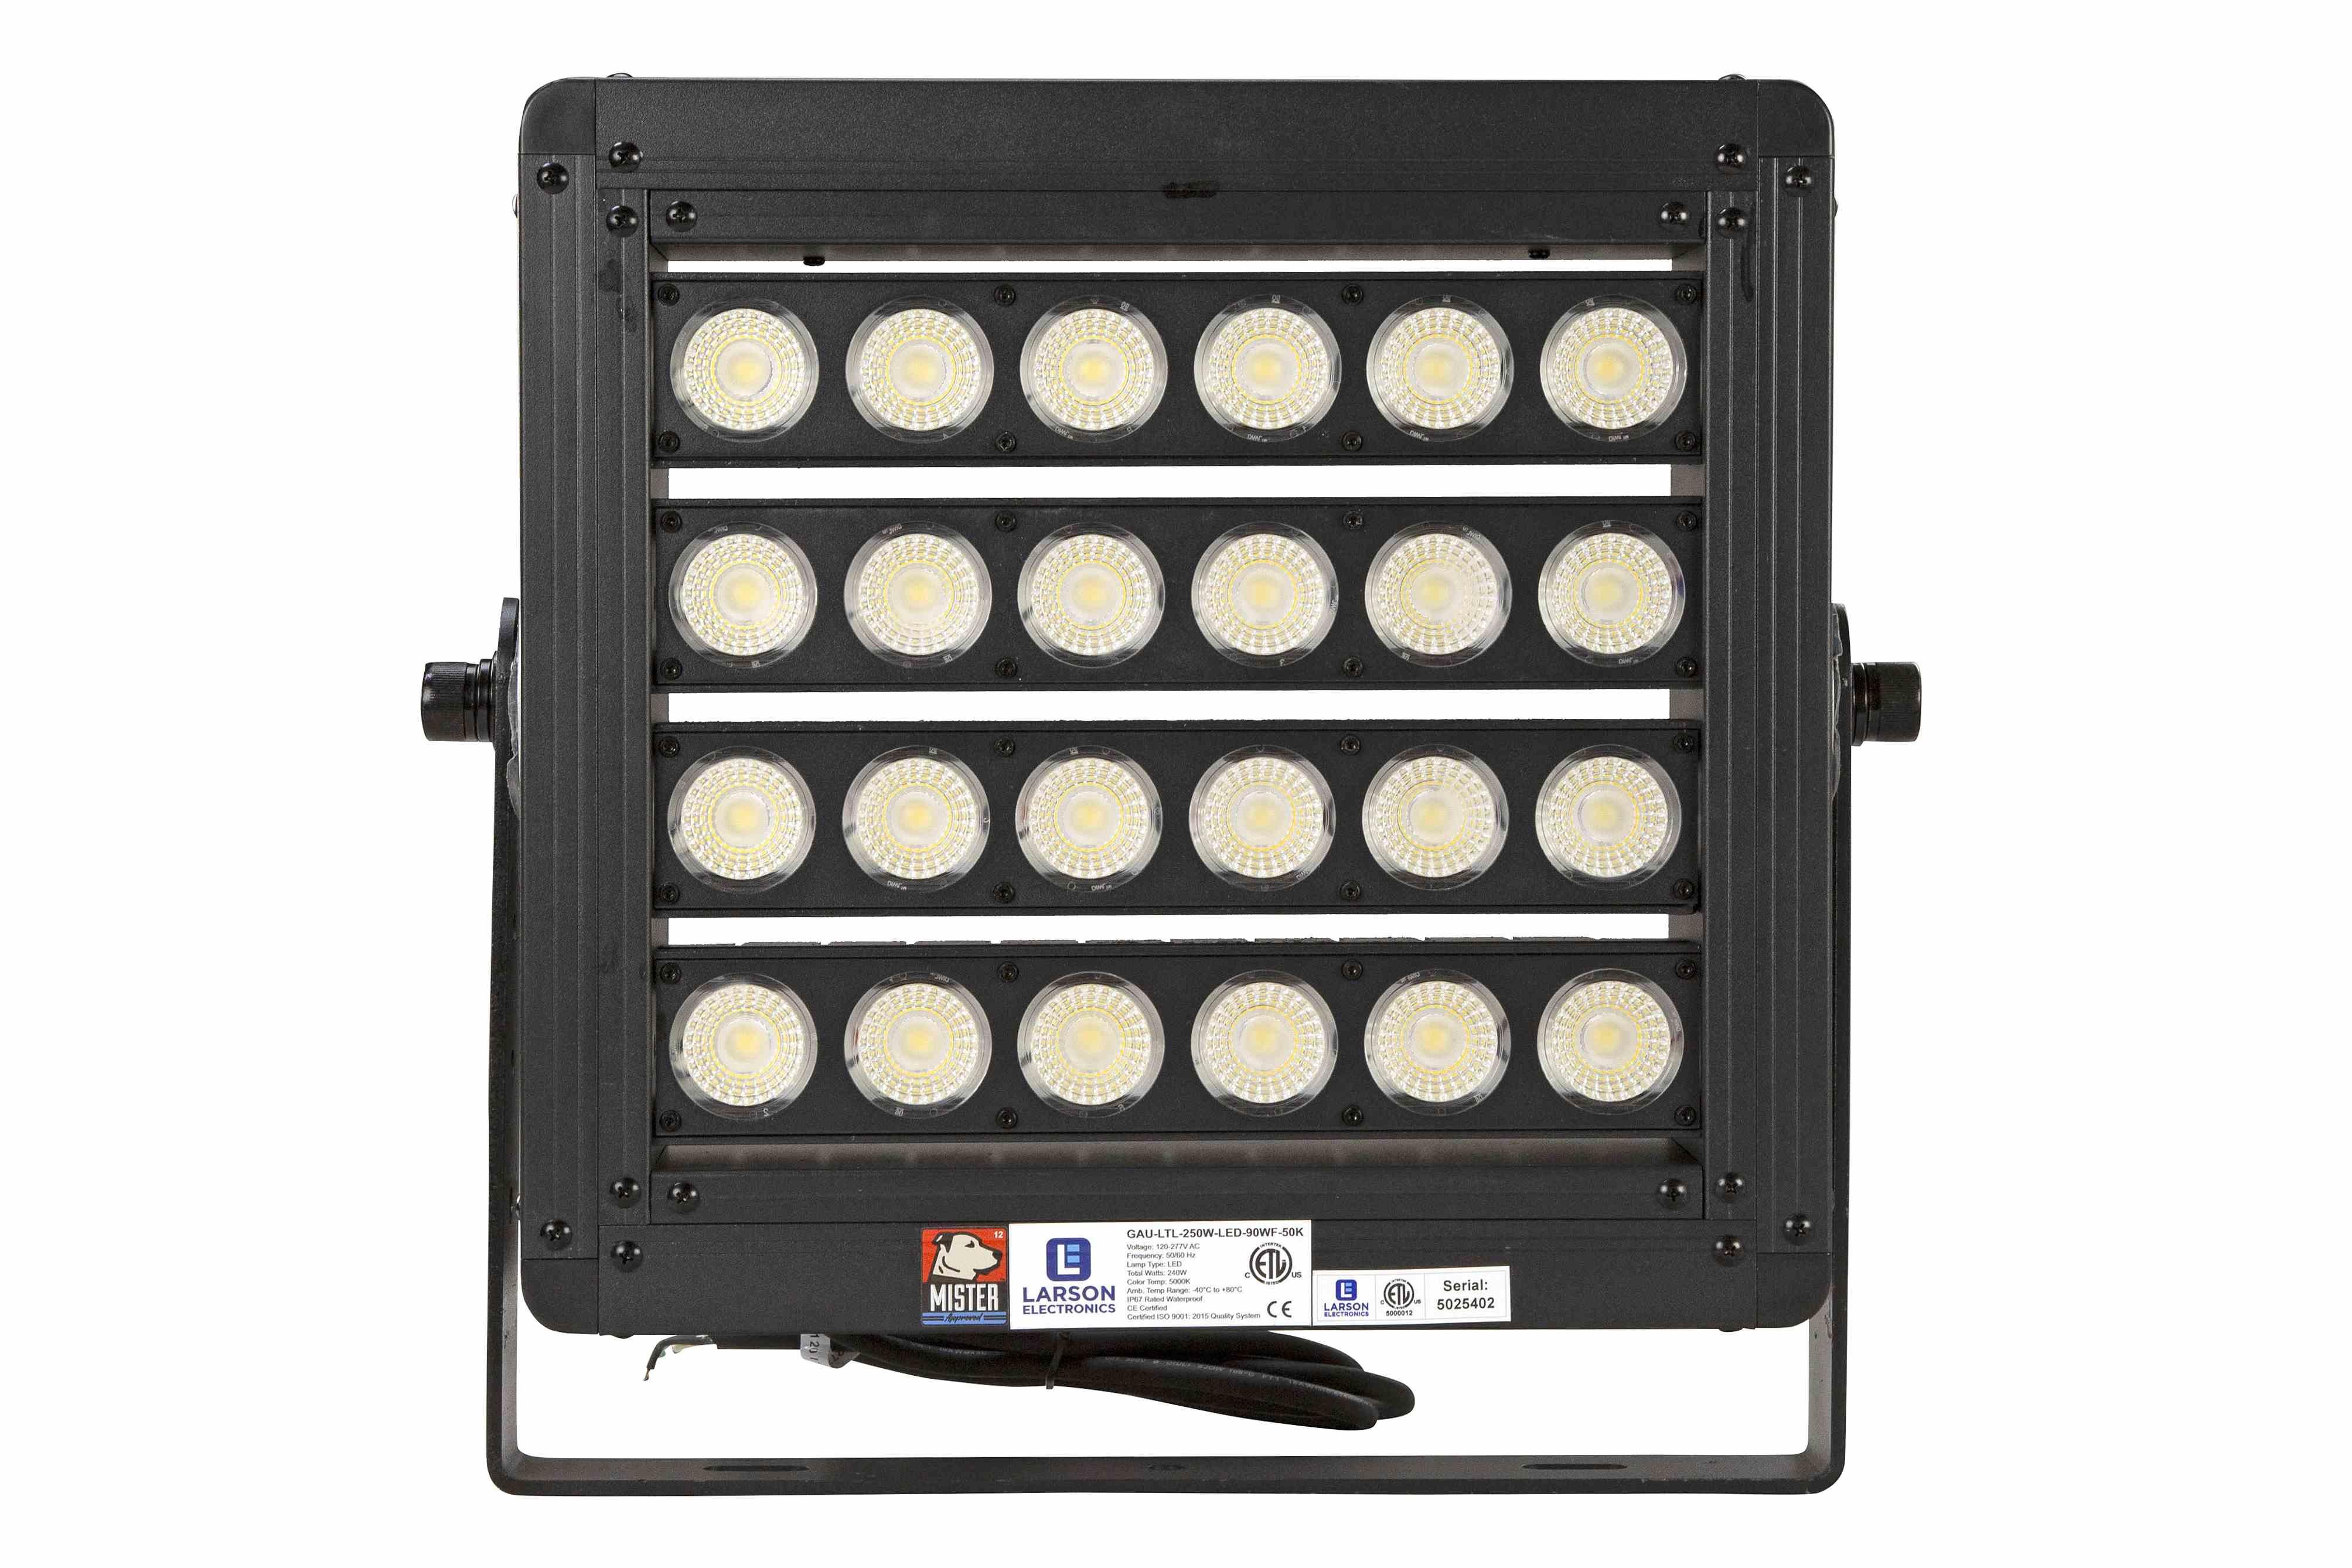 Larson Electronics 240 Watt High Intensity Led Light